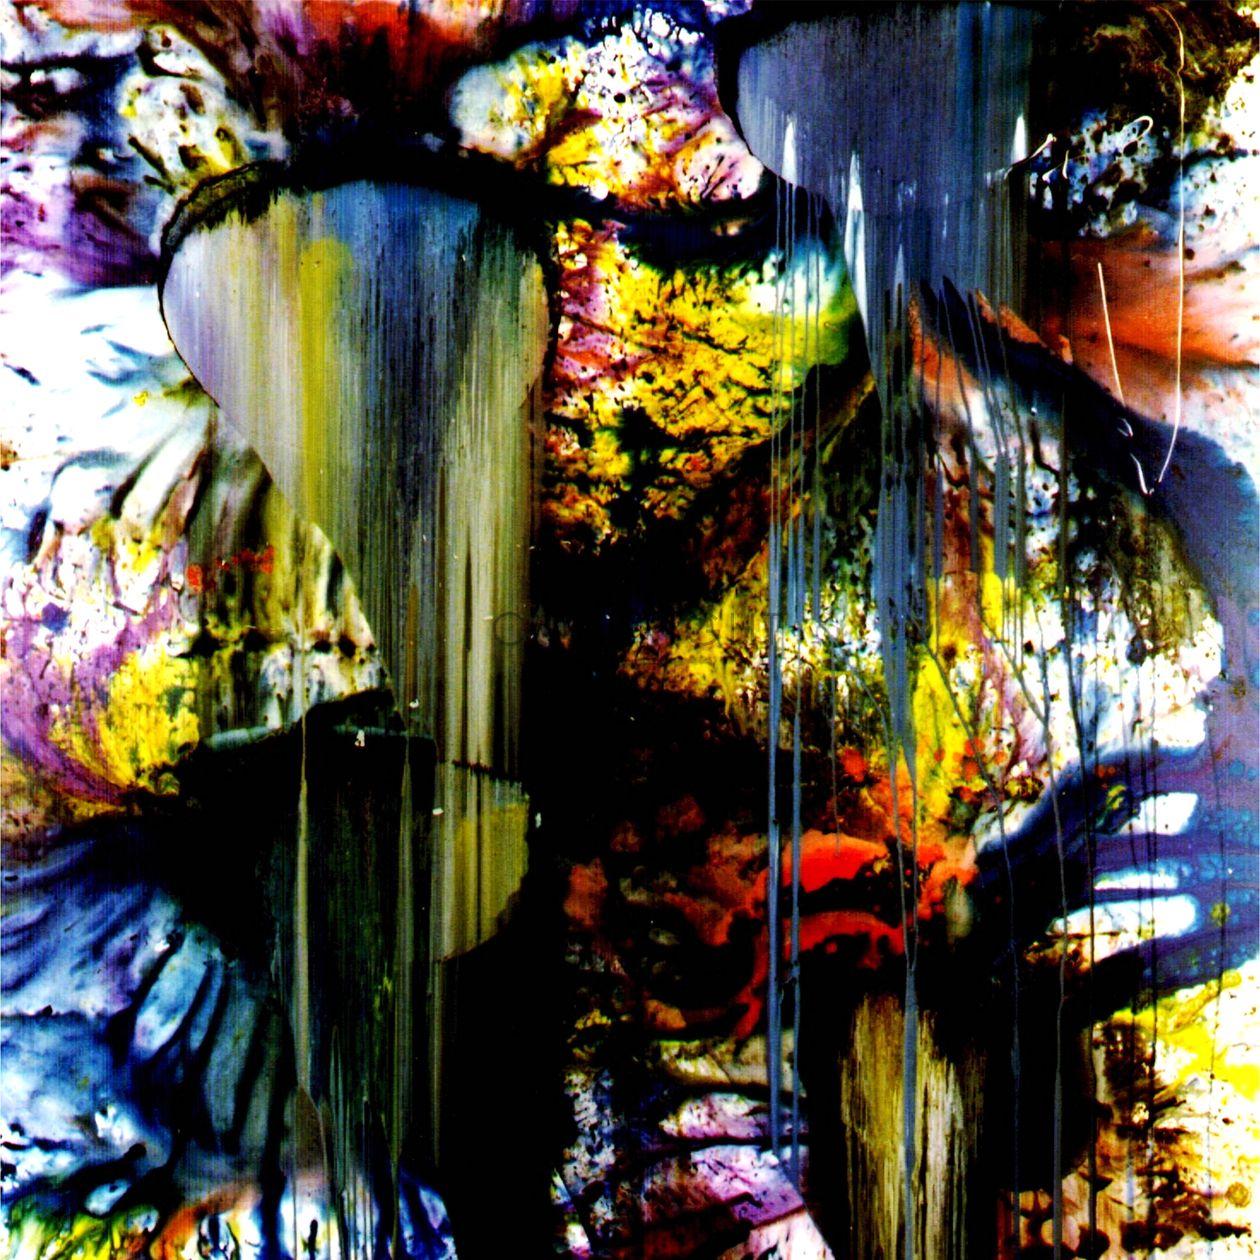 Abstrakte ,Malerei , Fotografie , Moderne Bilder,großformatig,  Onlineshop,Natur,Landschaft